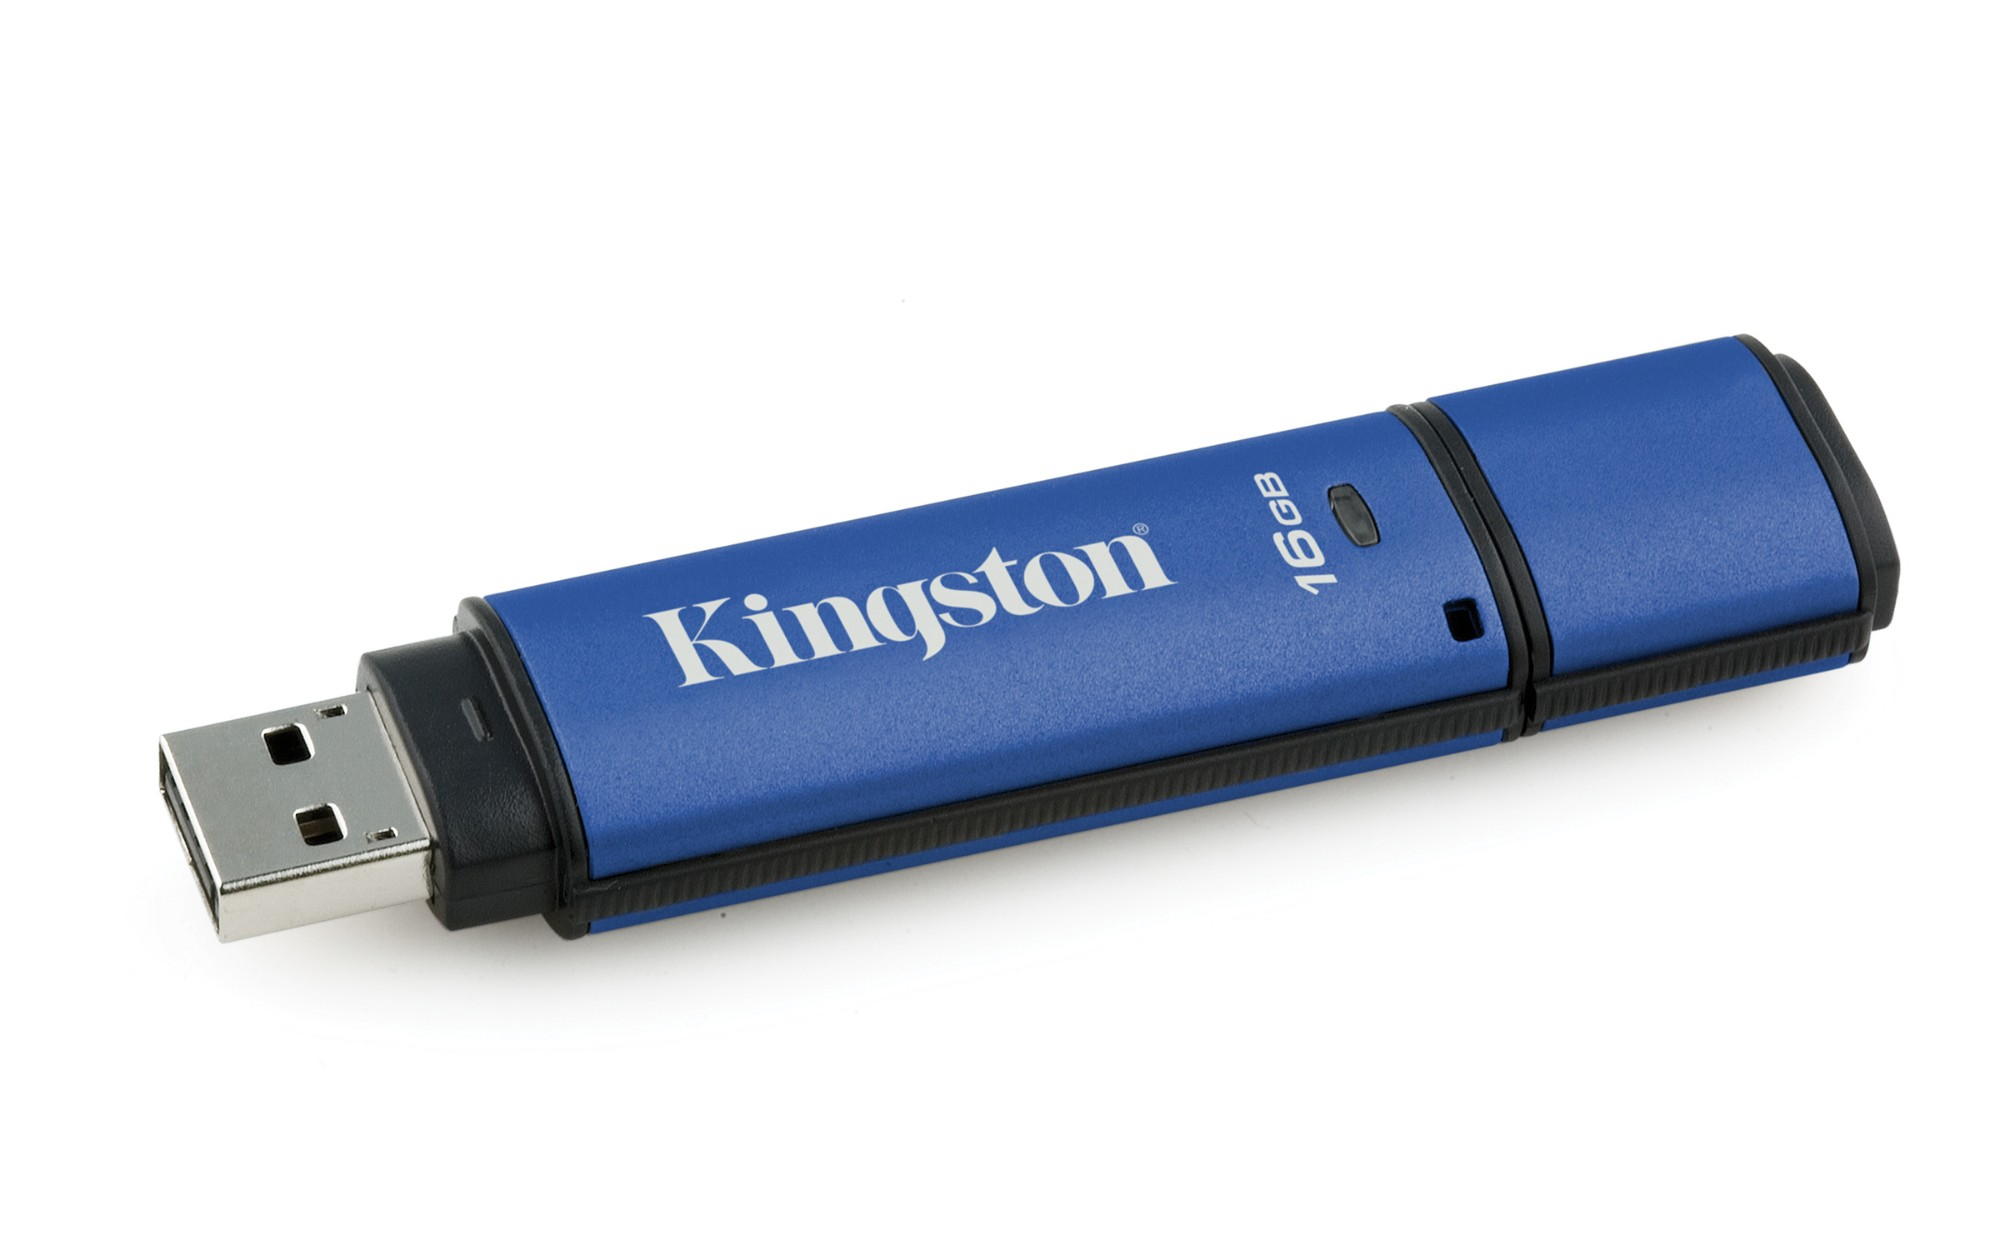 Kingston Technology Vault Privacy 3.0 with Management 16GB USB flash drive USB Type-A 3.0 (3.1 Gen 1) Zwart, Blauw